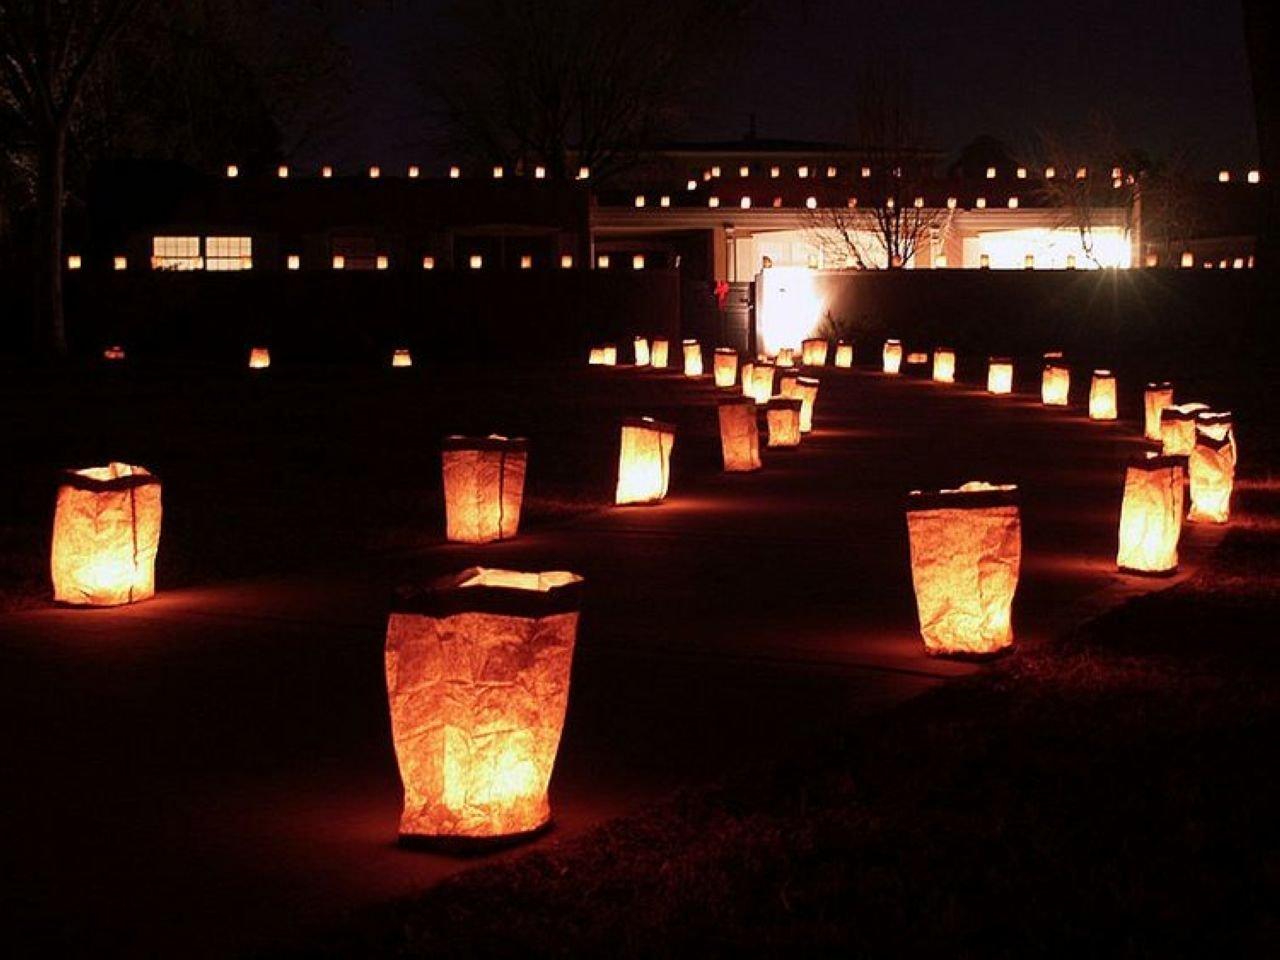 Fascola 20 x Pure White Luminaria Paper Lantern Candle Bag For Xmas BBQ Party Wedding